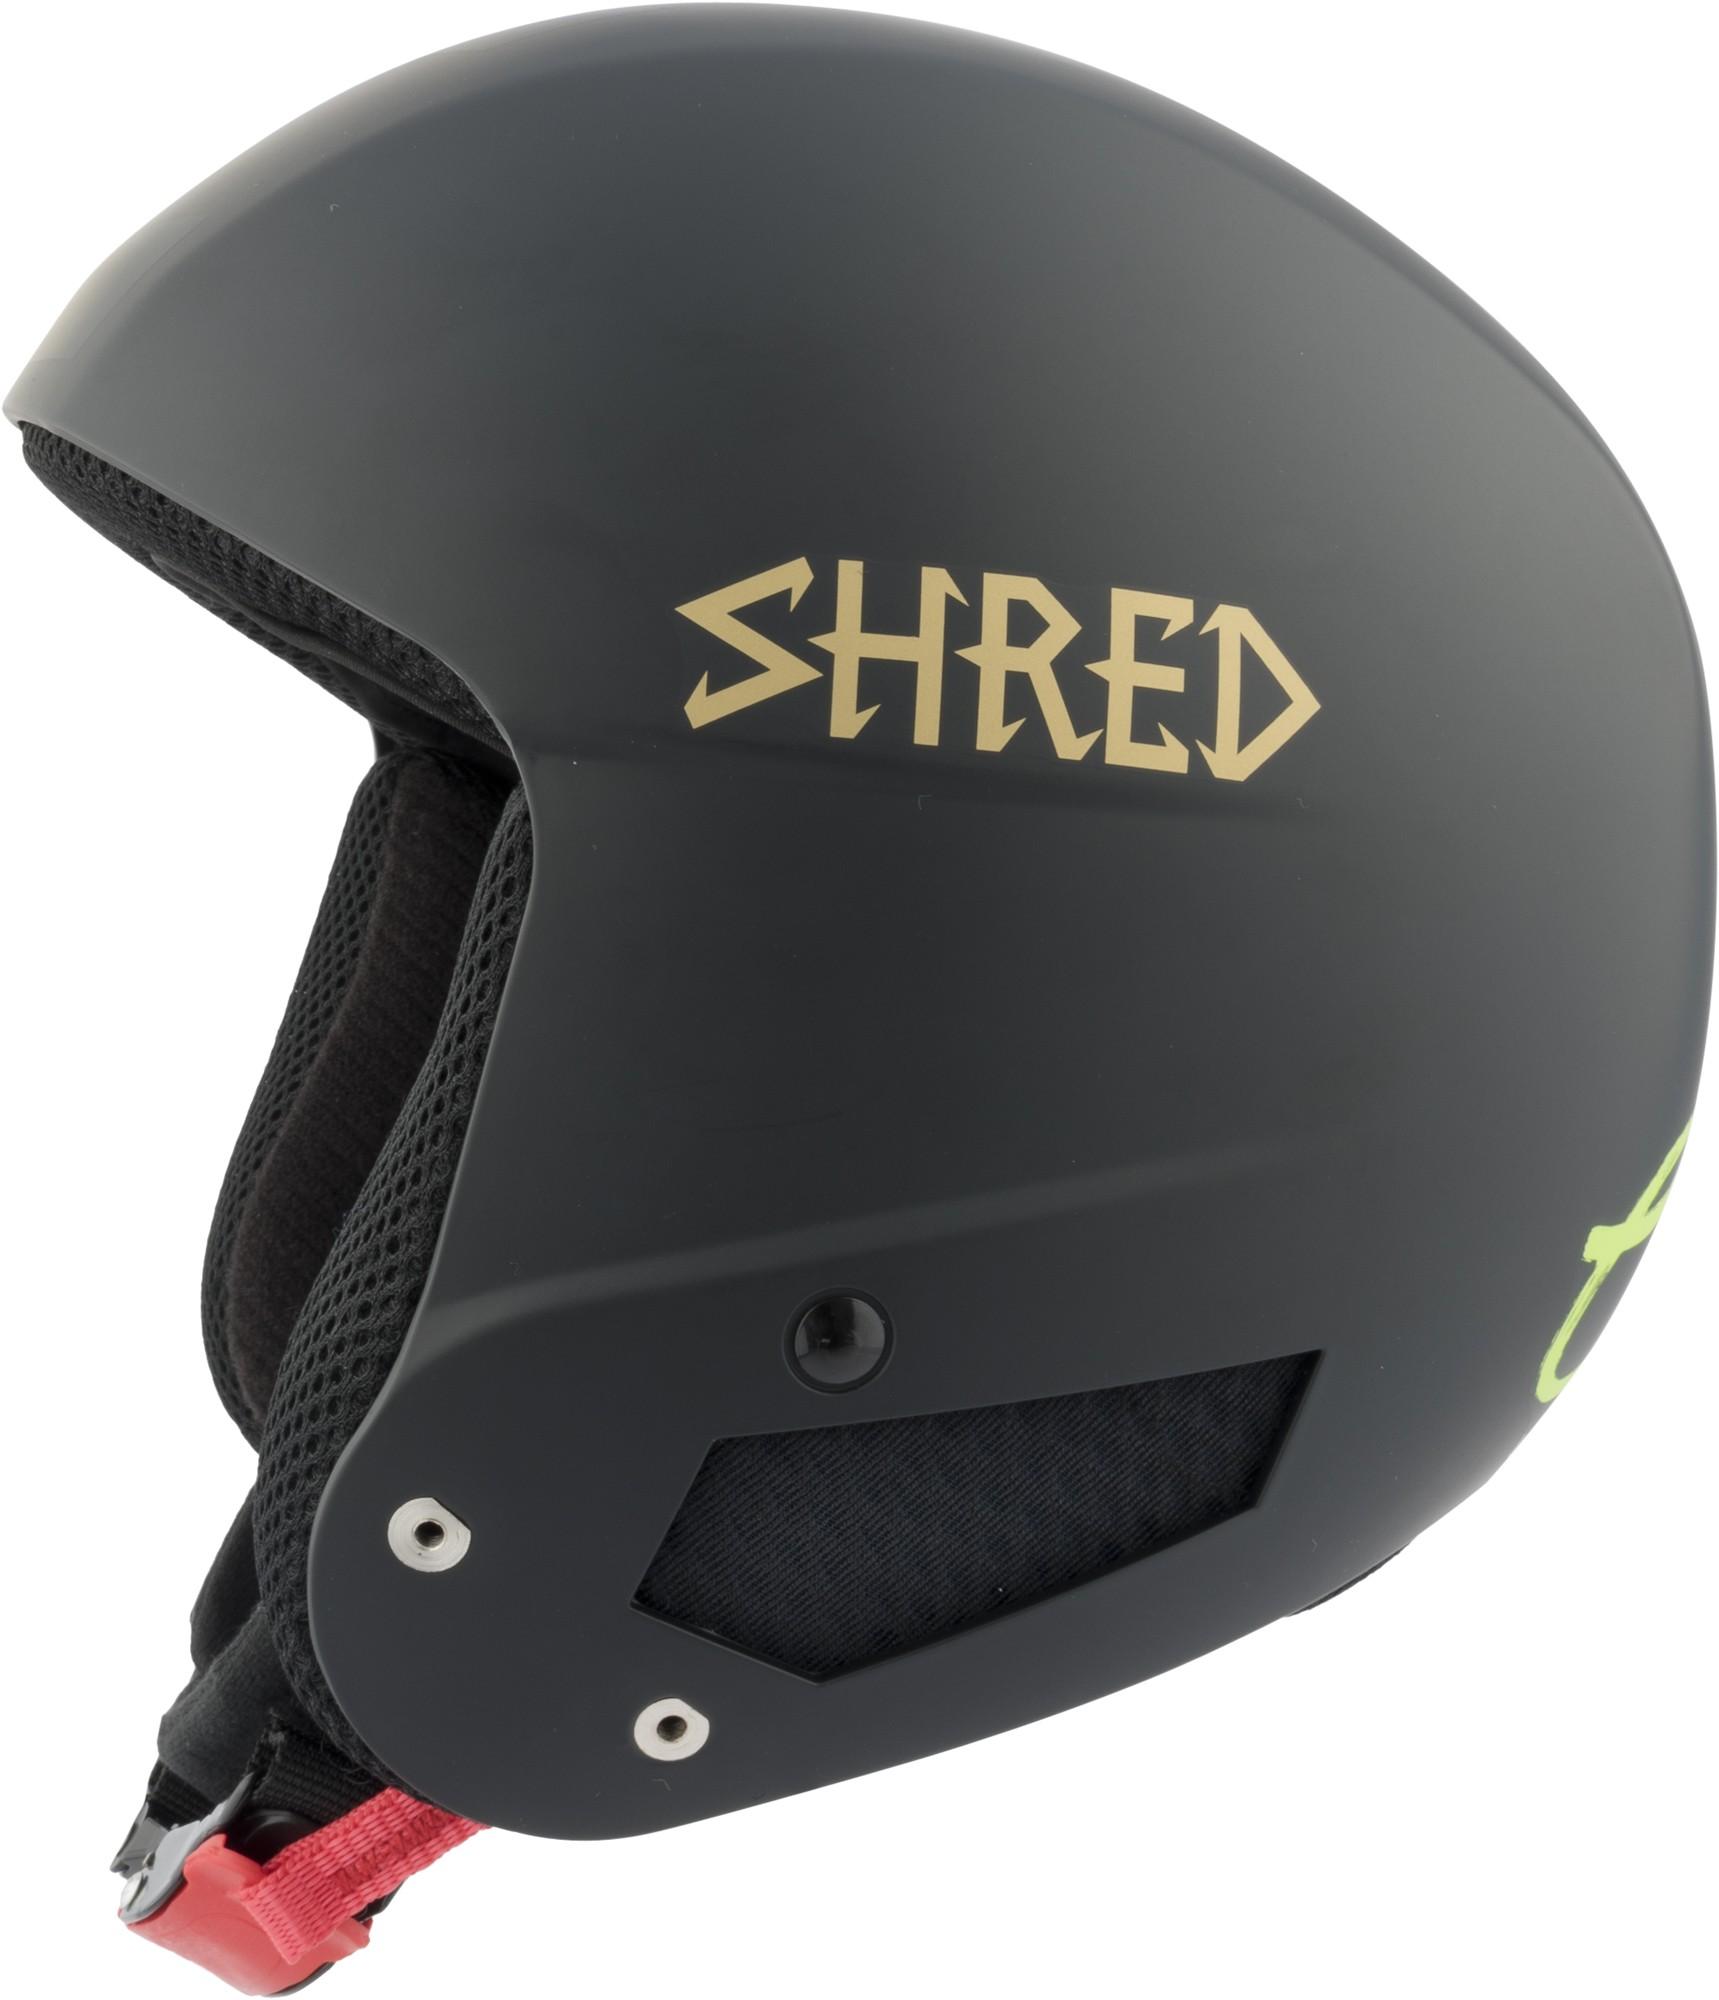 Shred Mega Brain Bucket RH FIS LG (Lara Gut) ski helmet, 2017